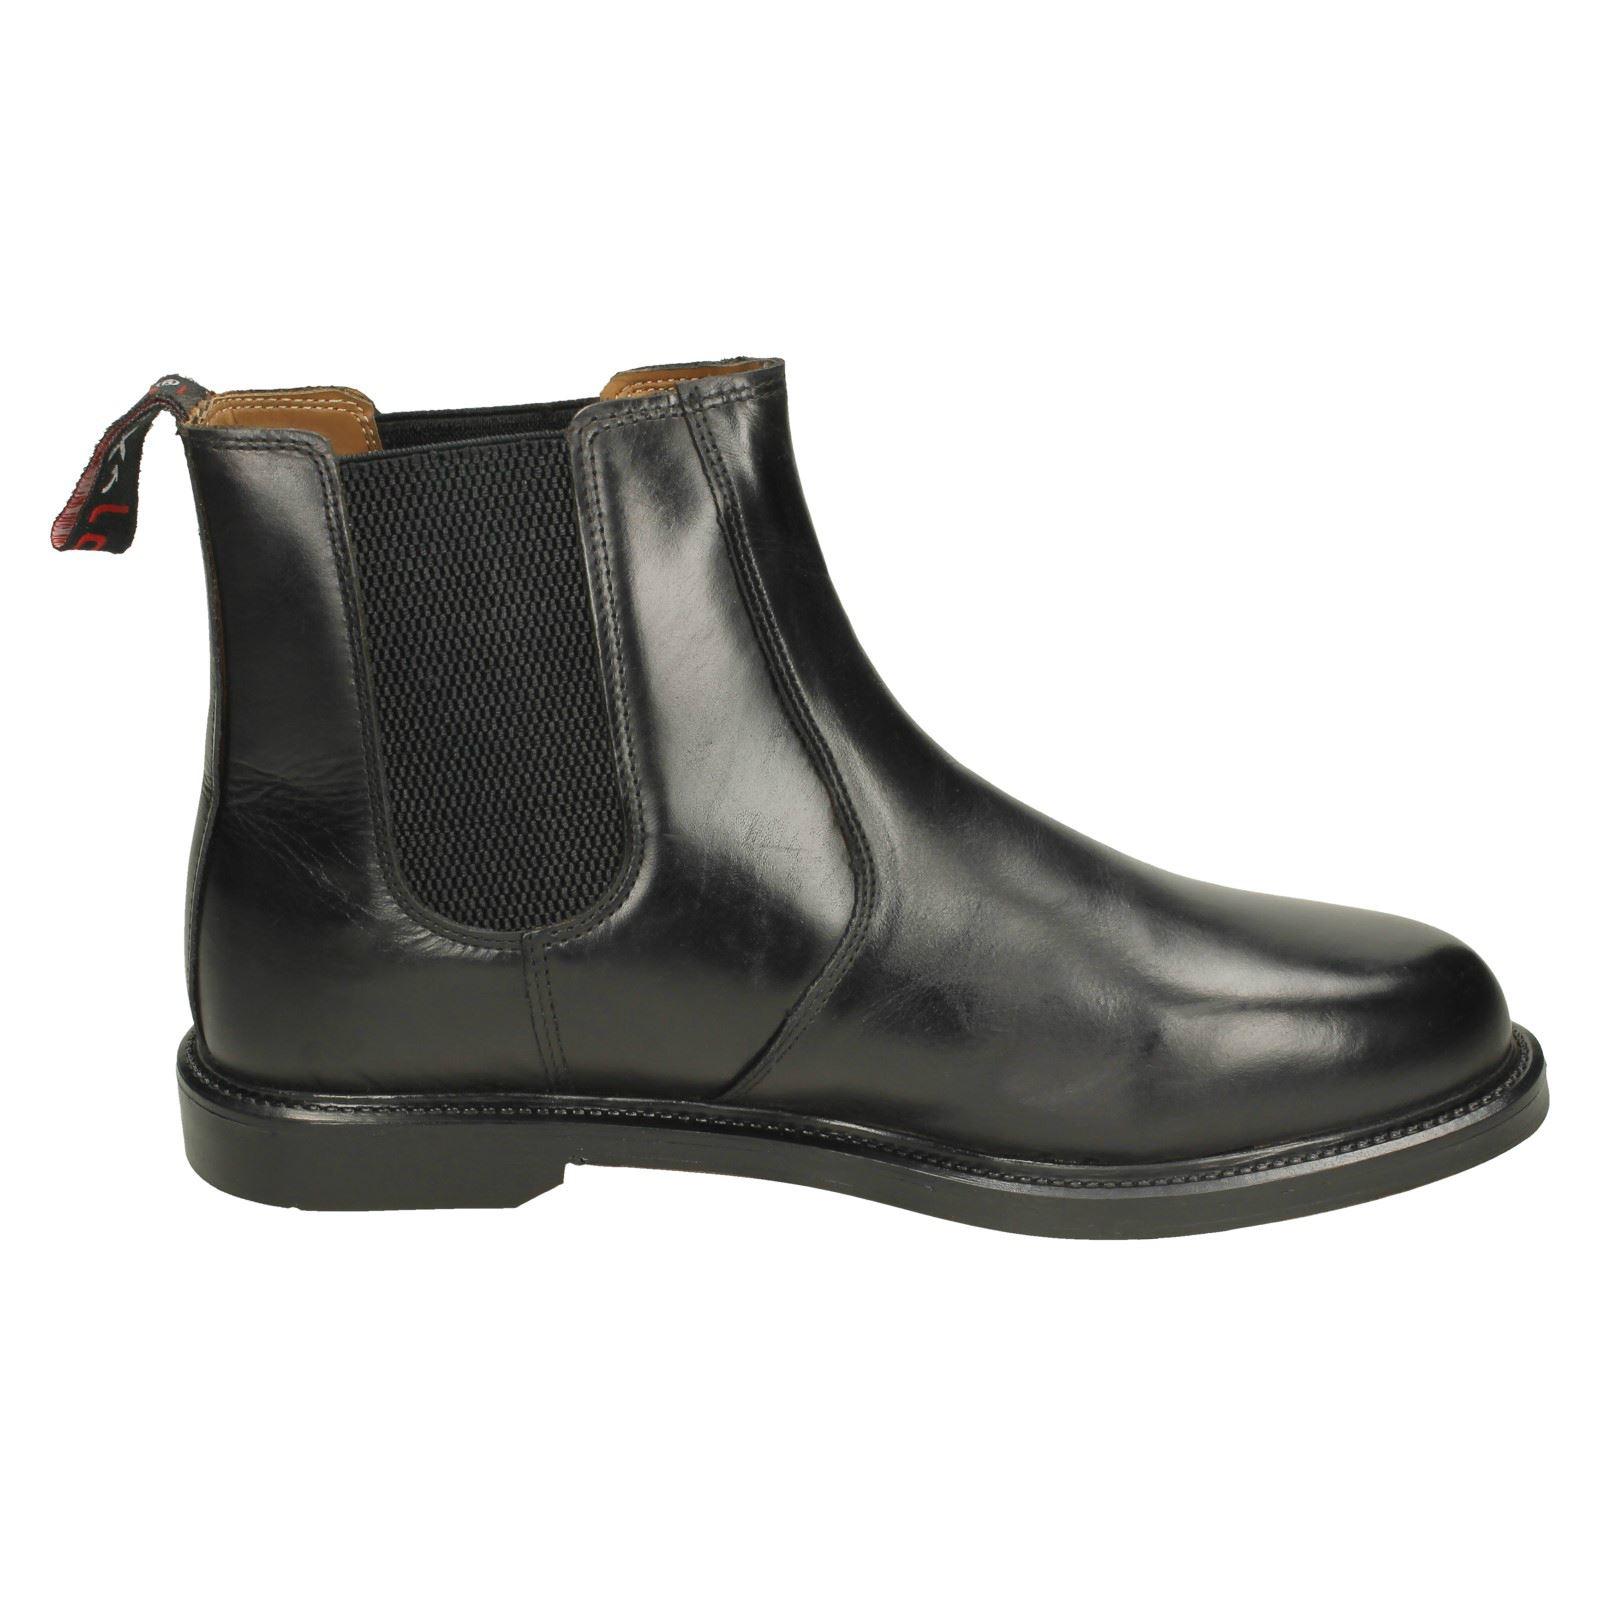 'Mens HX London' Slip On Ankle Boots HX05